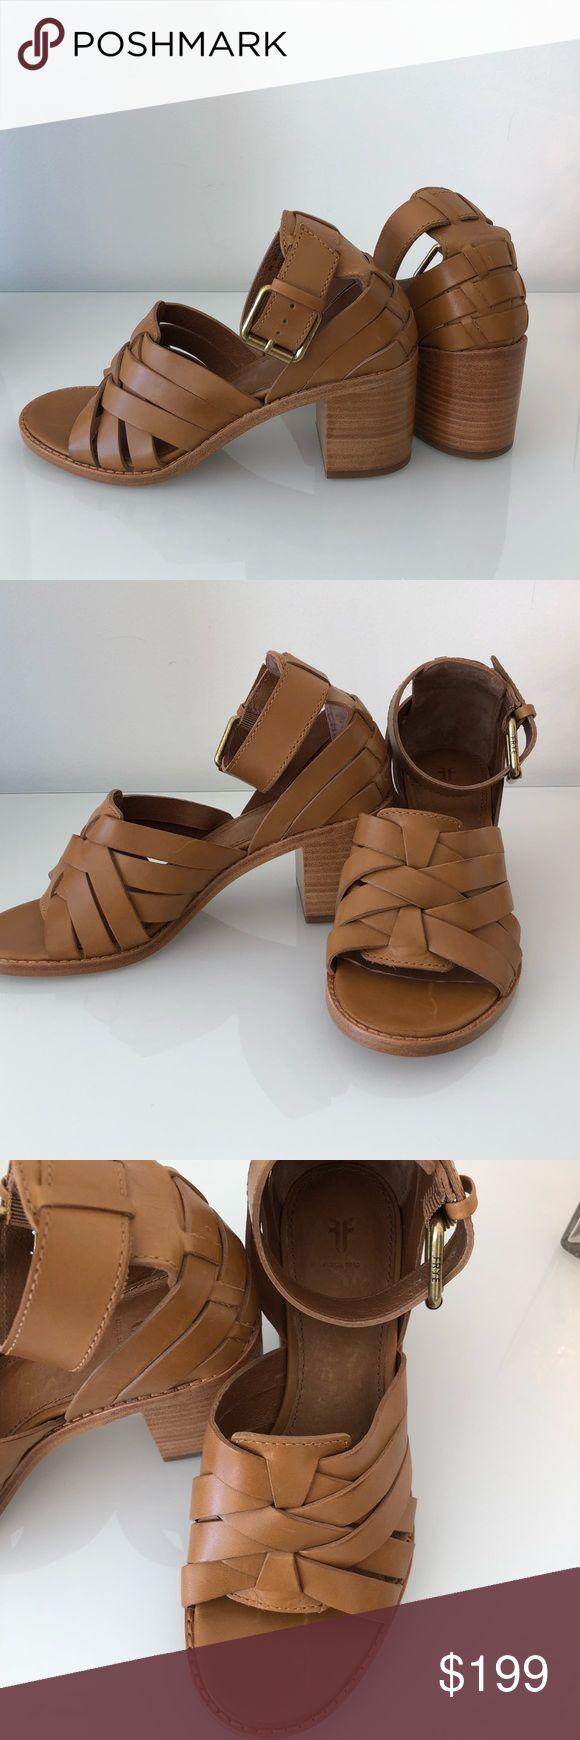 NWOT Frye Sandals Bela sandália Frye de couro marrom / camelo. Detai incrível …   – My Posh Picks